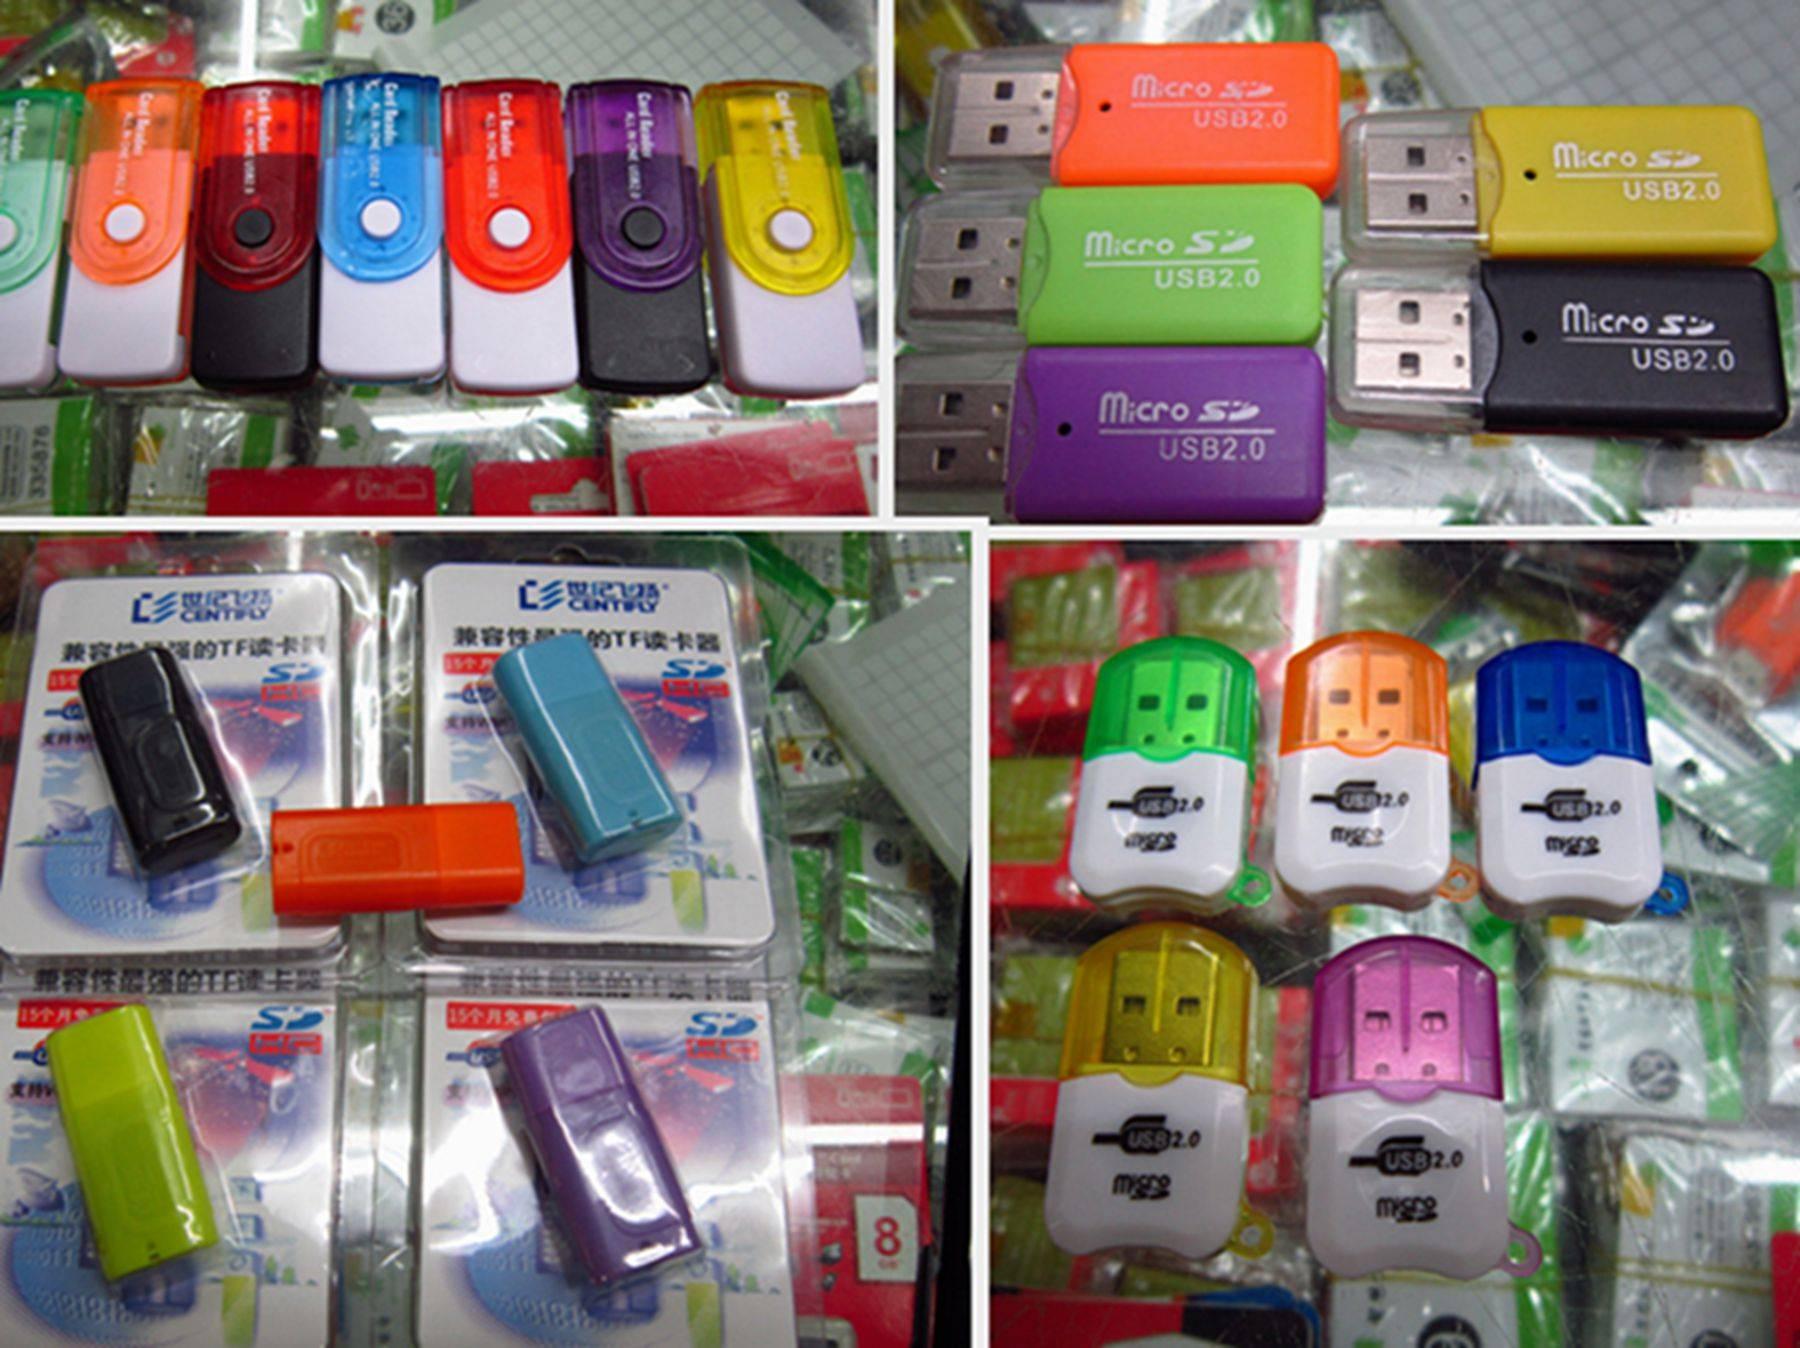 Cellphone Memory Card Reader, Mobile phone Tablet Micro SD/TF Card Reader, Camera Card Reader